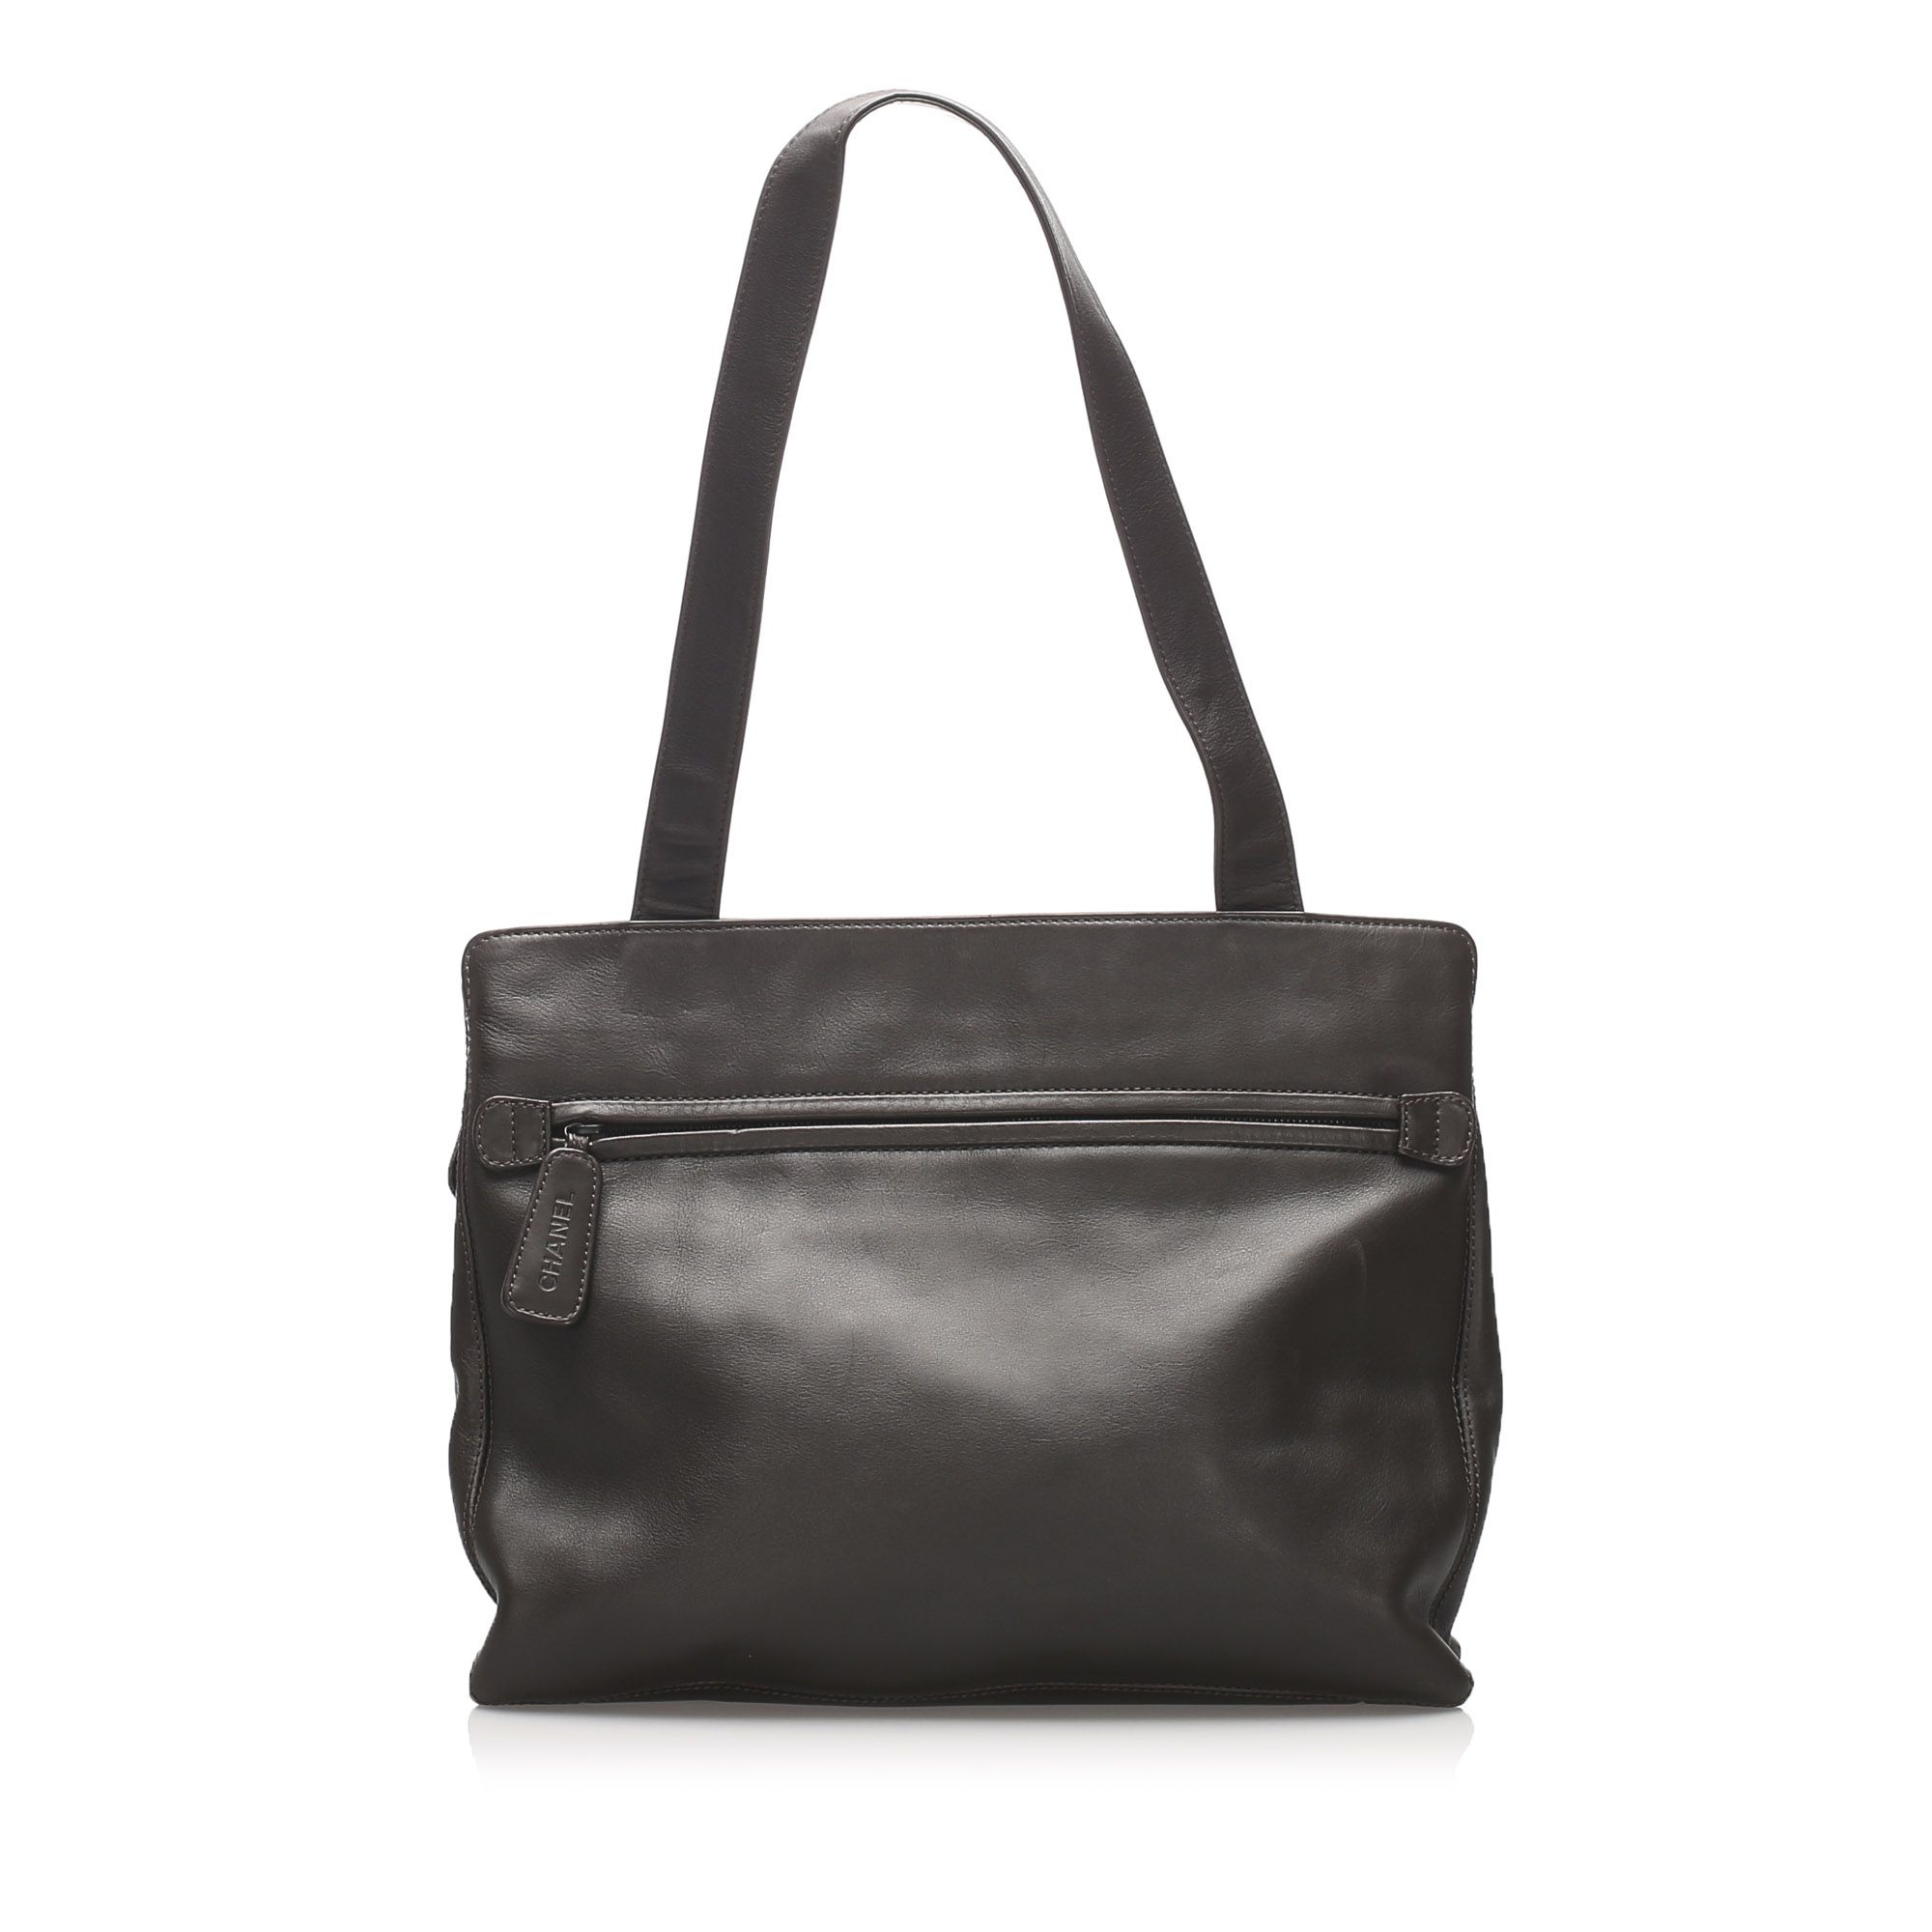 Vintage Chanel CC Lambskin Leather Tote Bag Black